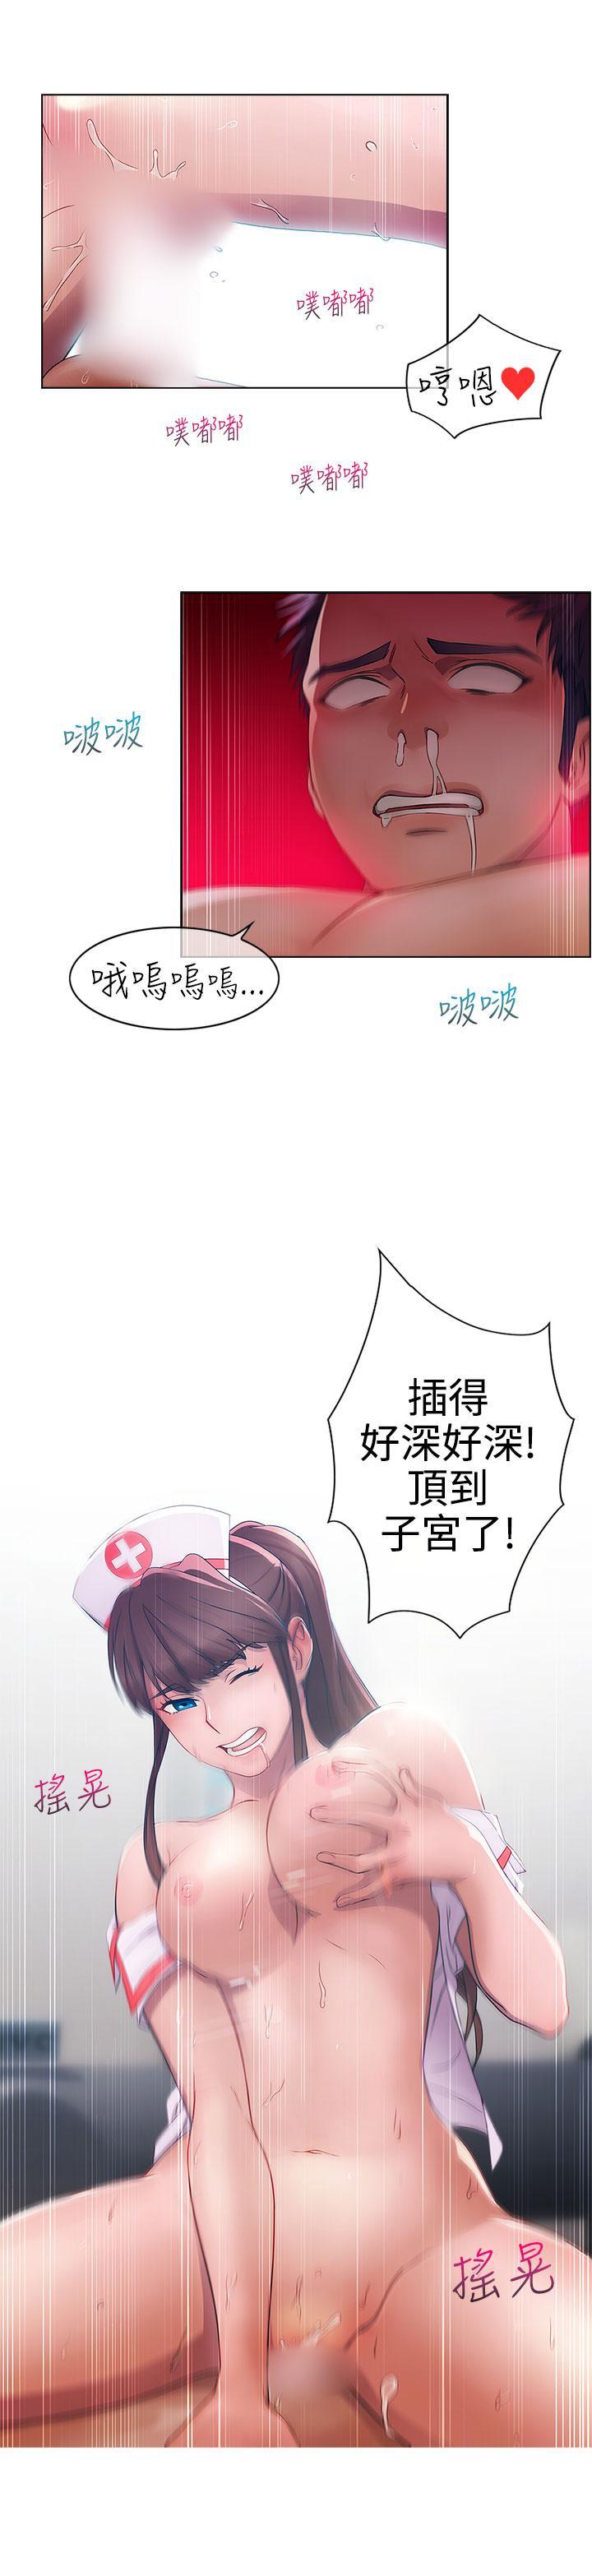 [Studio Gale] Lady Garden淑女花苑 第1話 [Chinese]中文 9